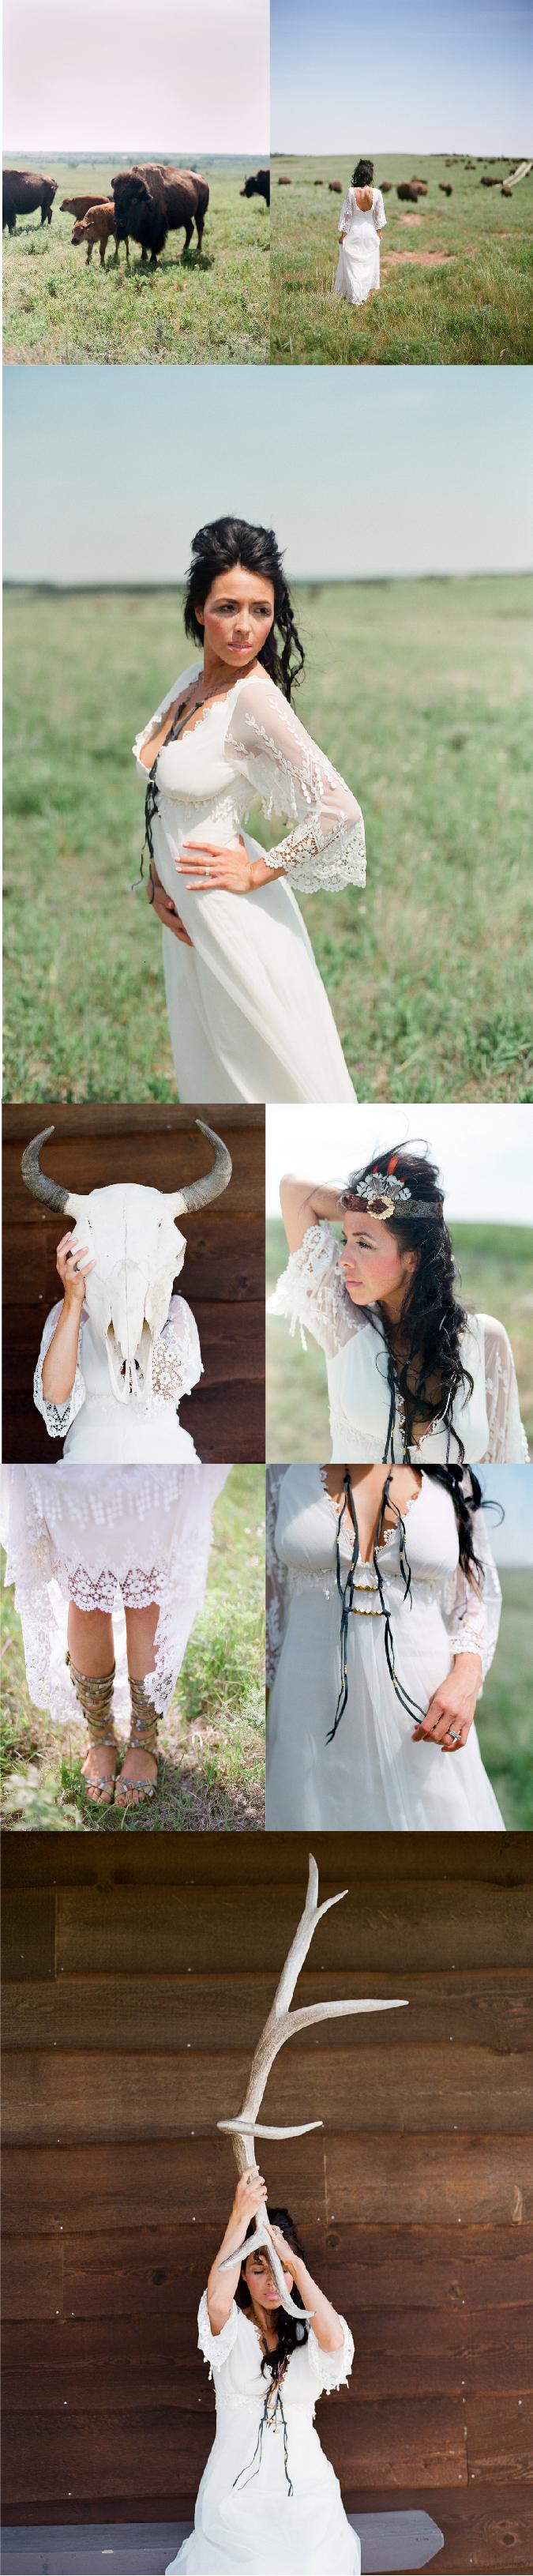 Rustic Wedding Ideas Free People Claire Pettibone Native American